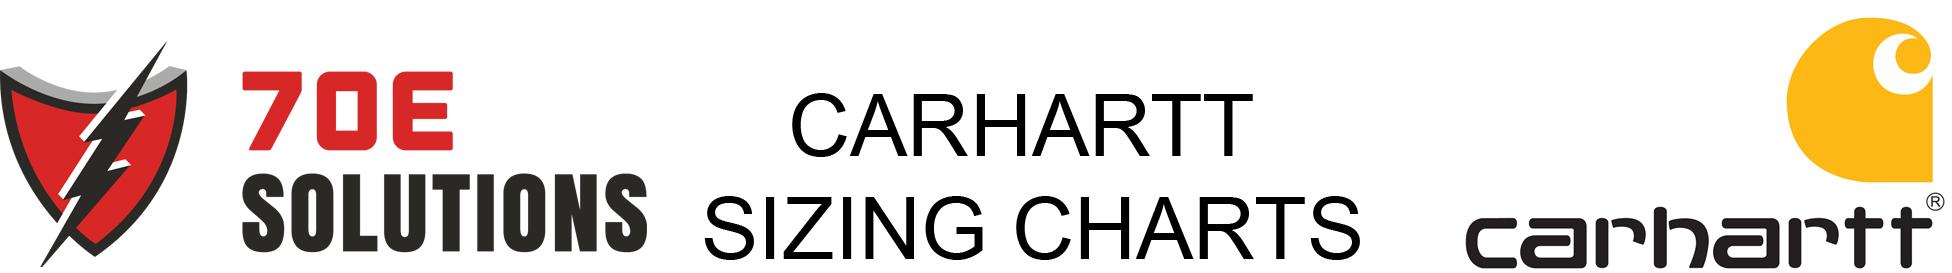 Carhartt sizing charts